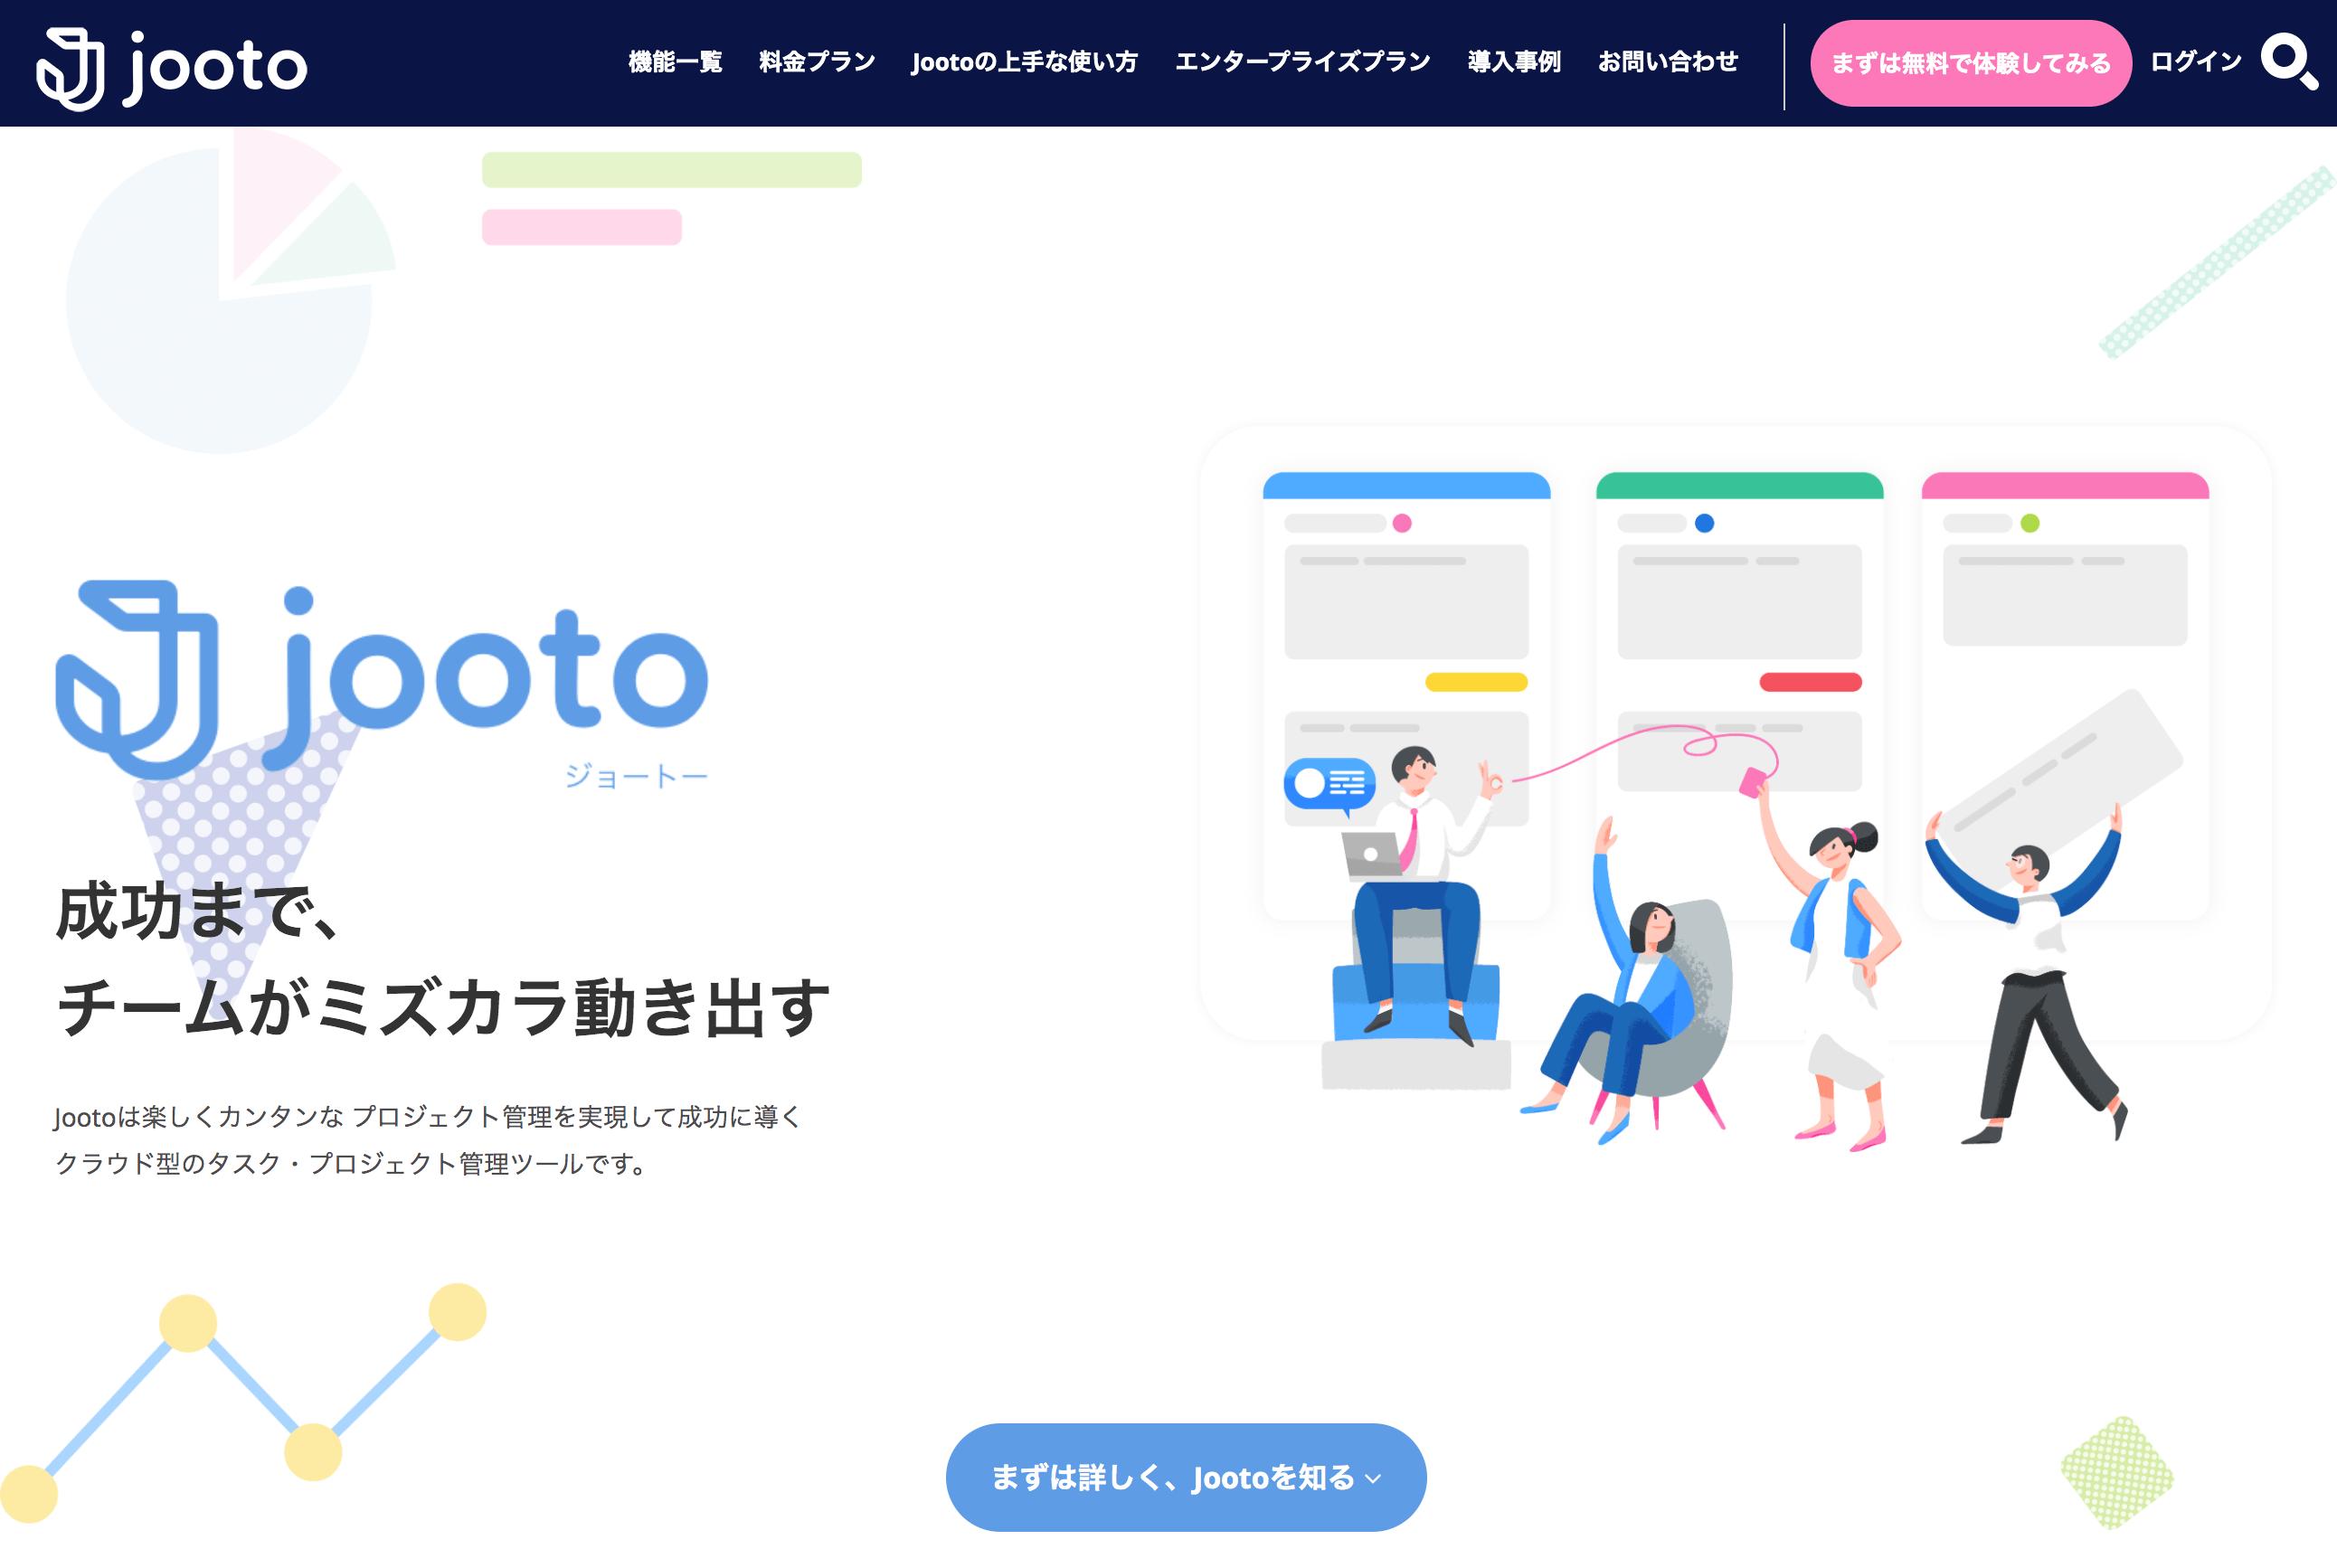 Jooto スクリーンショット